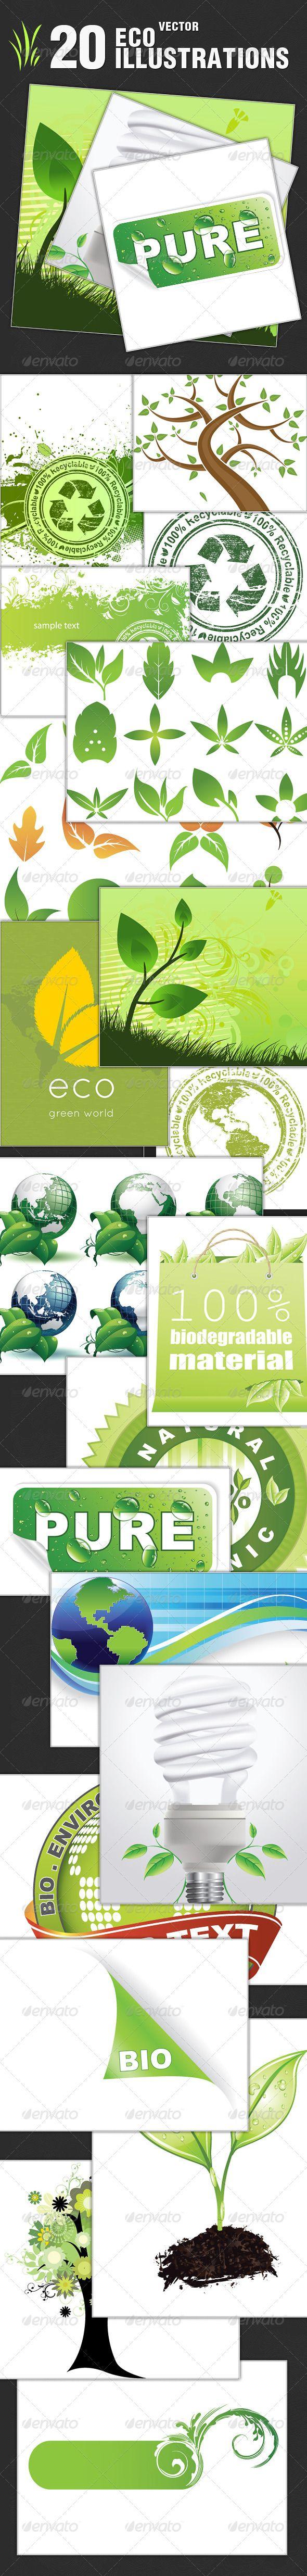 19 Best Working It Images On Pinterest Business Coaching Windows 7 Profesional Win Pro Coa Bonus Stiker Logo Dan Installer 20 Eco Vector Illustrations